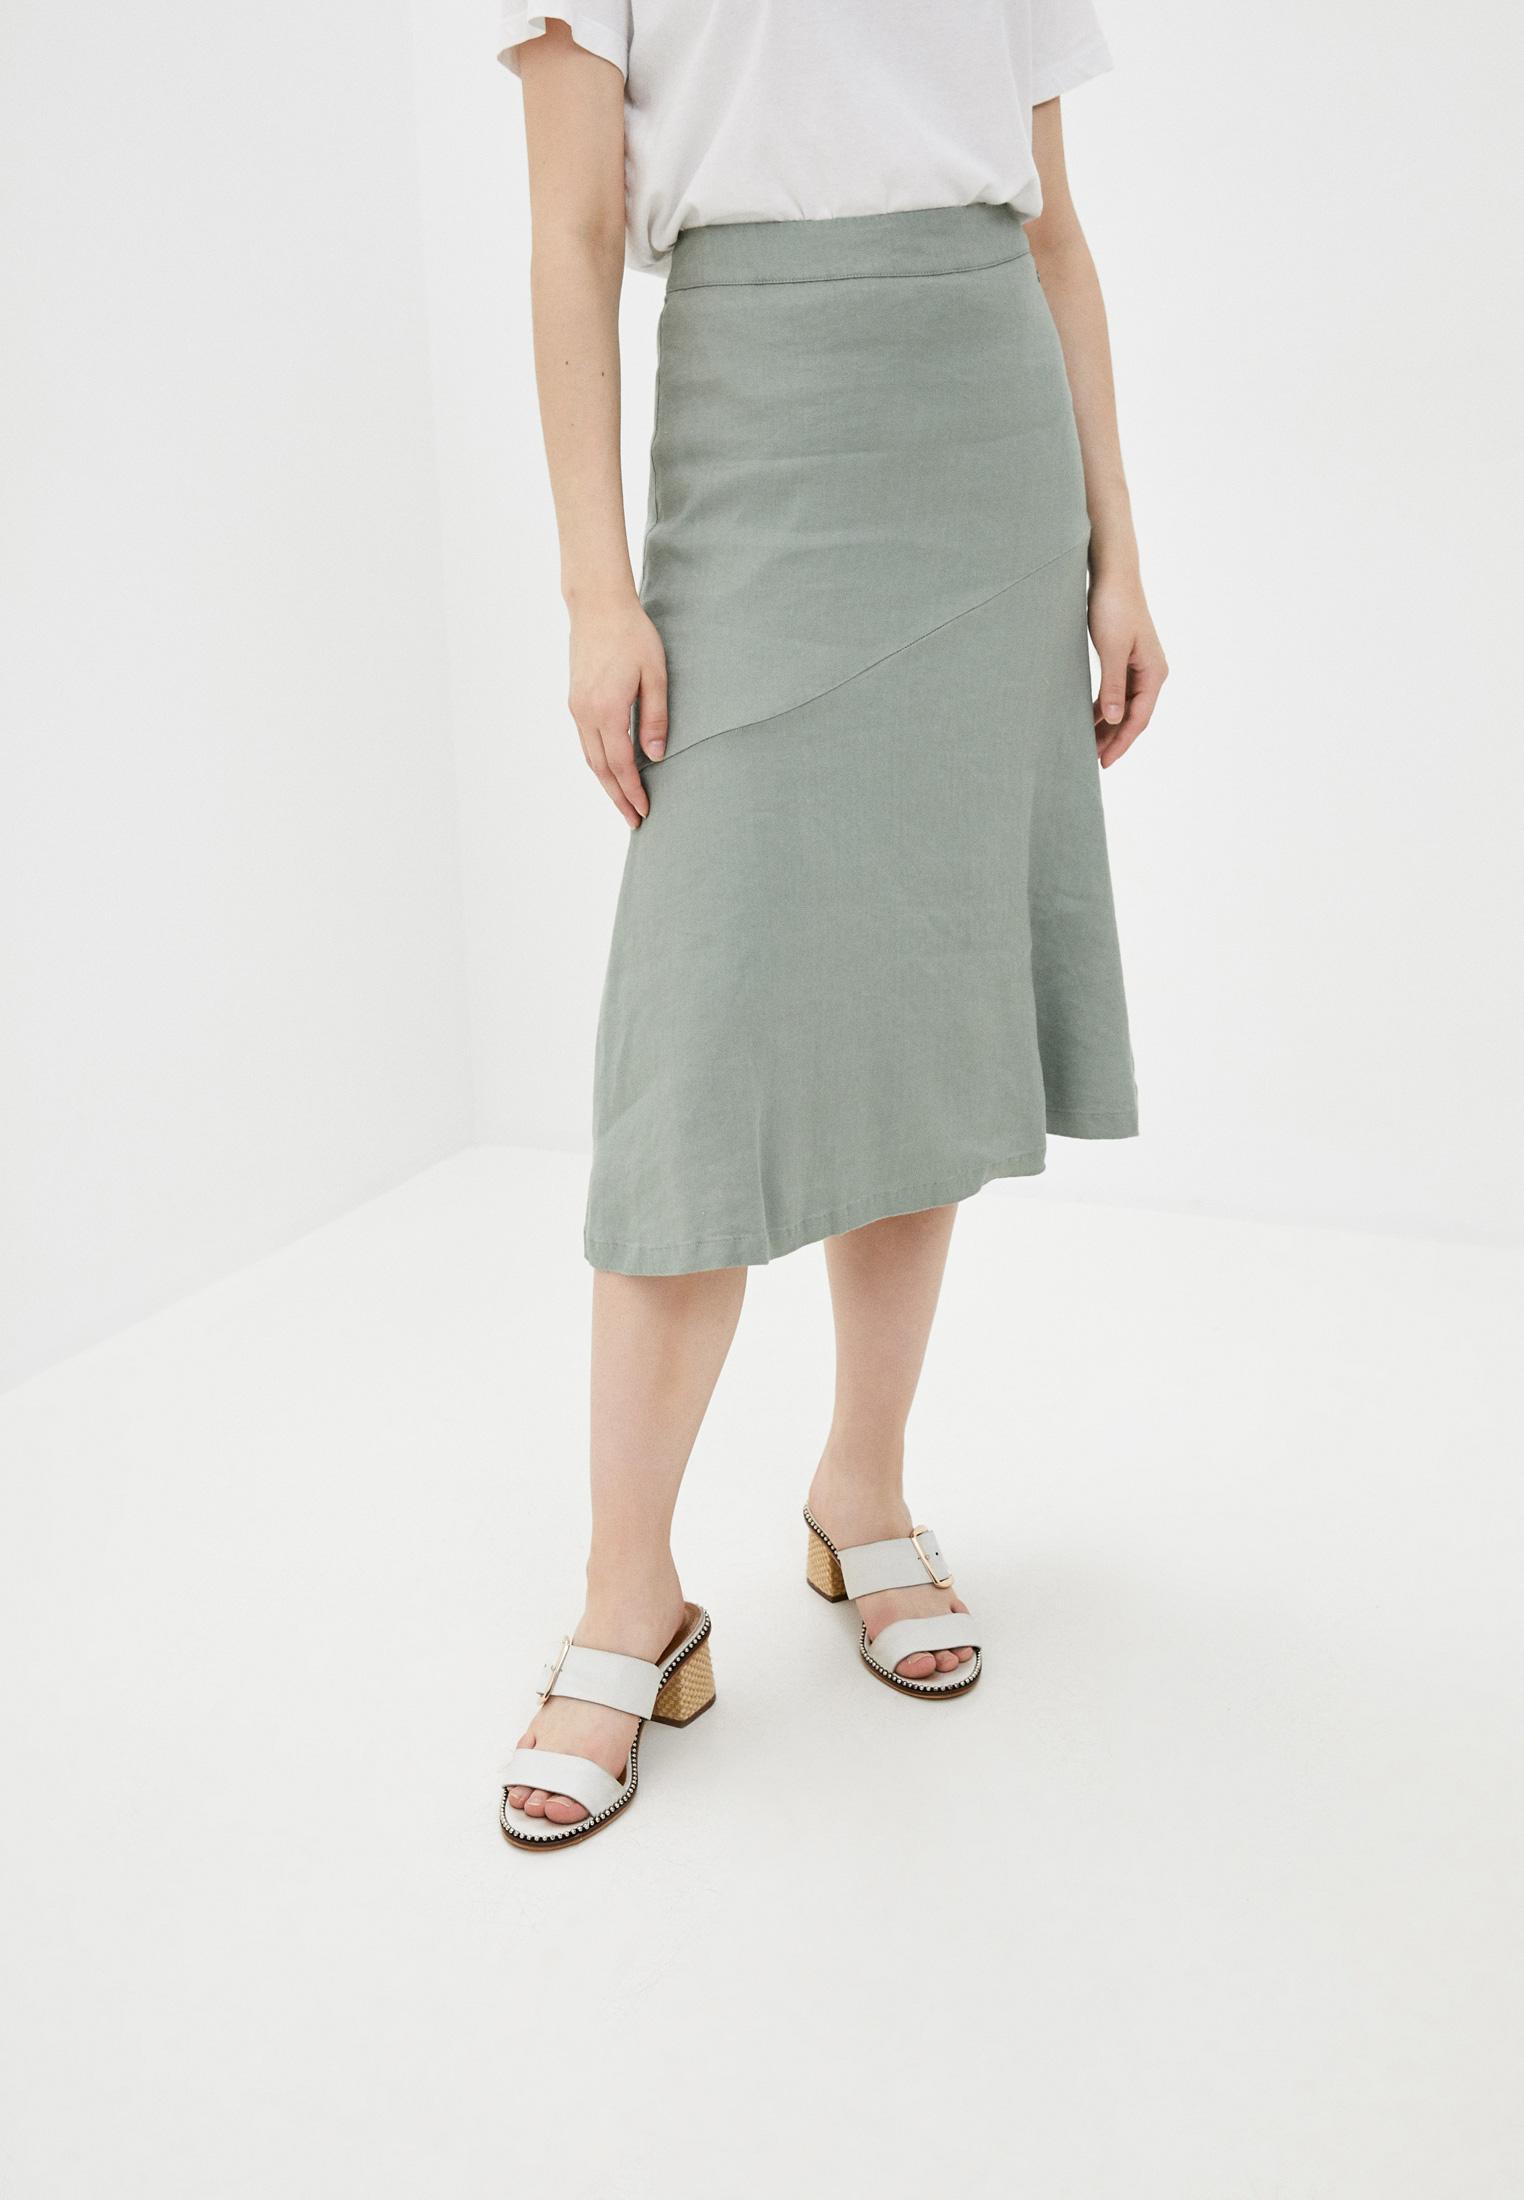 Широкая юбка Finn Flare (Фин Флаер) S19-110129